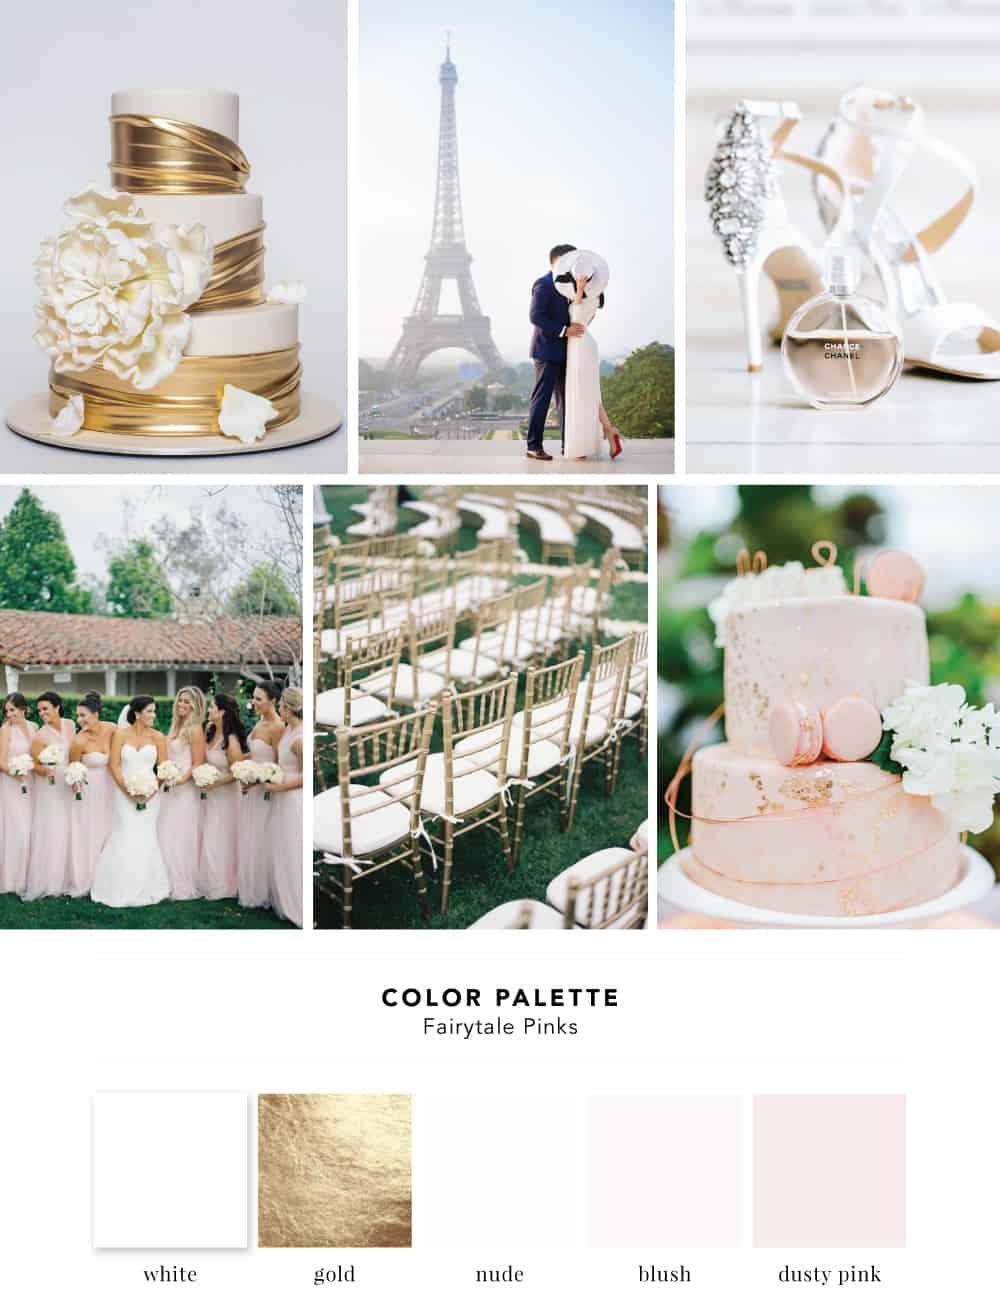 Color-Palette-Fairytale-Pinks